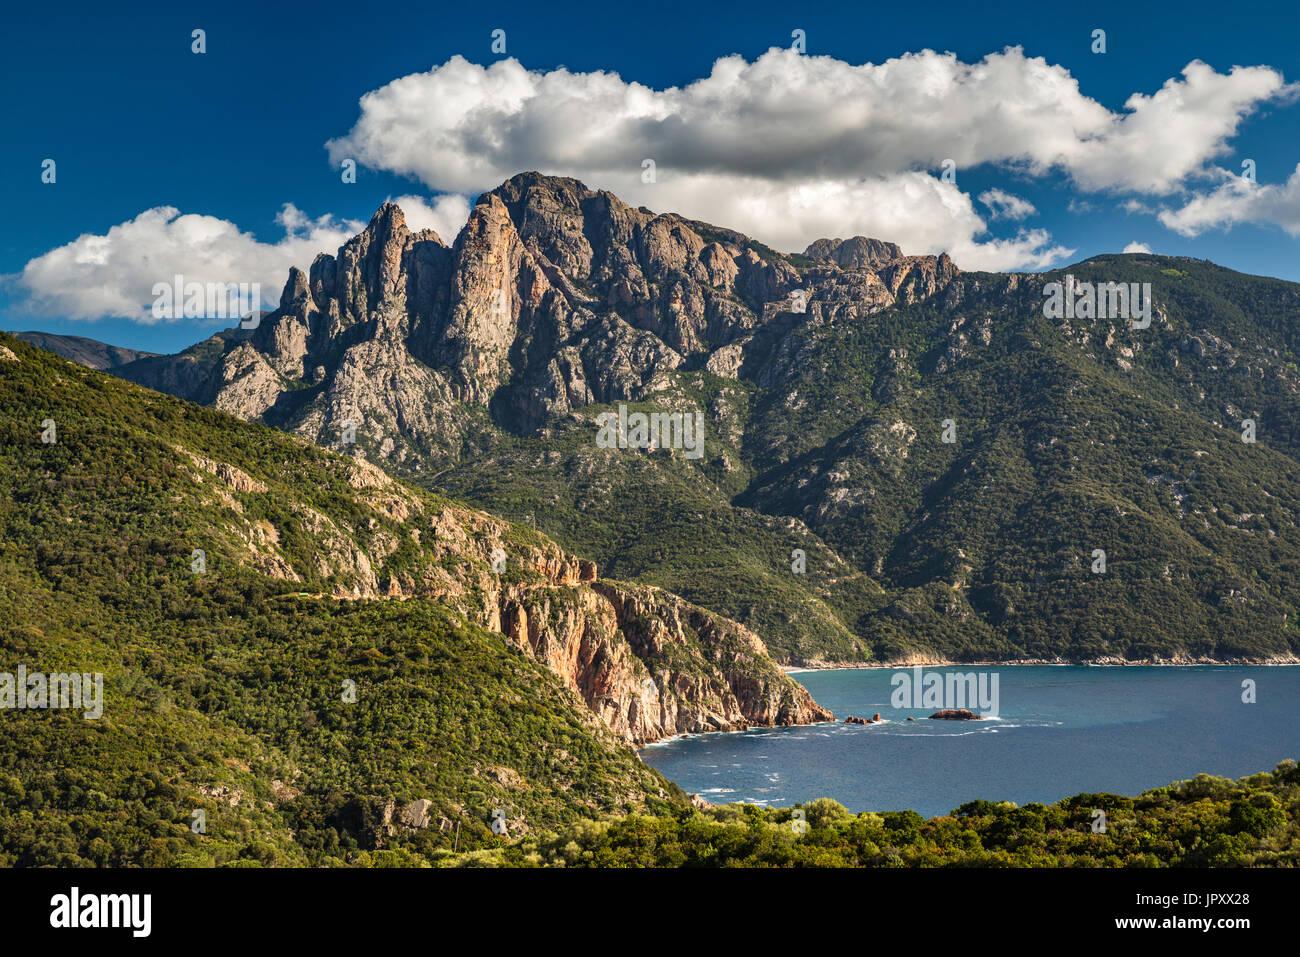 El Capo d'Orto, Capo di u Vitullo detrás, a lo largo de Golfe de Porto, el Mar Mediterráneo, Corse du Sud, Córcega, Francia Imagen De Stock